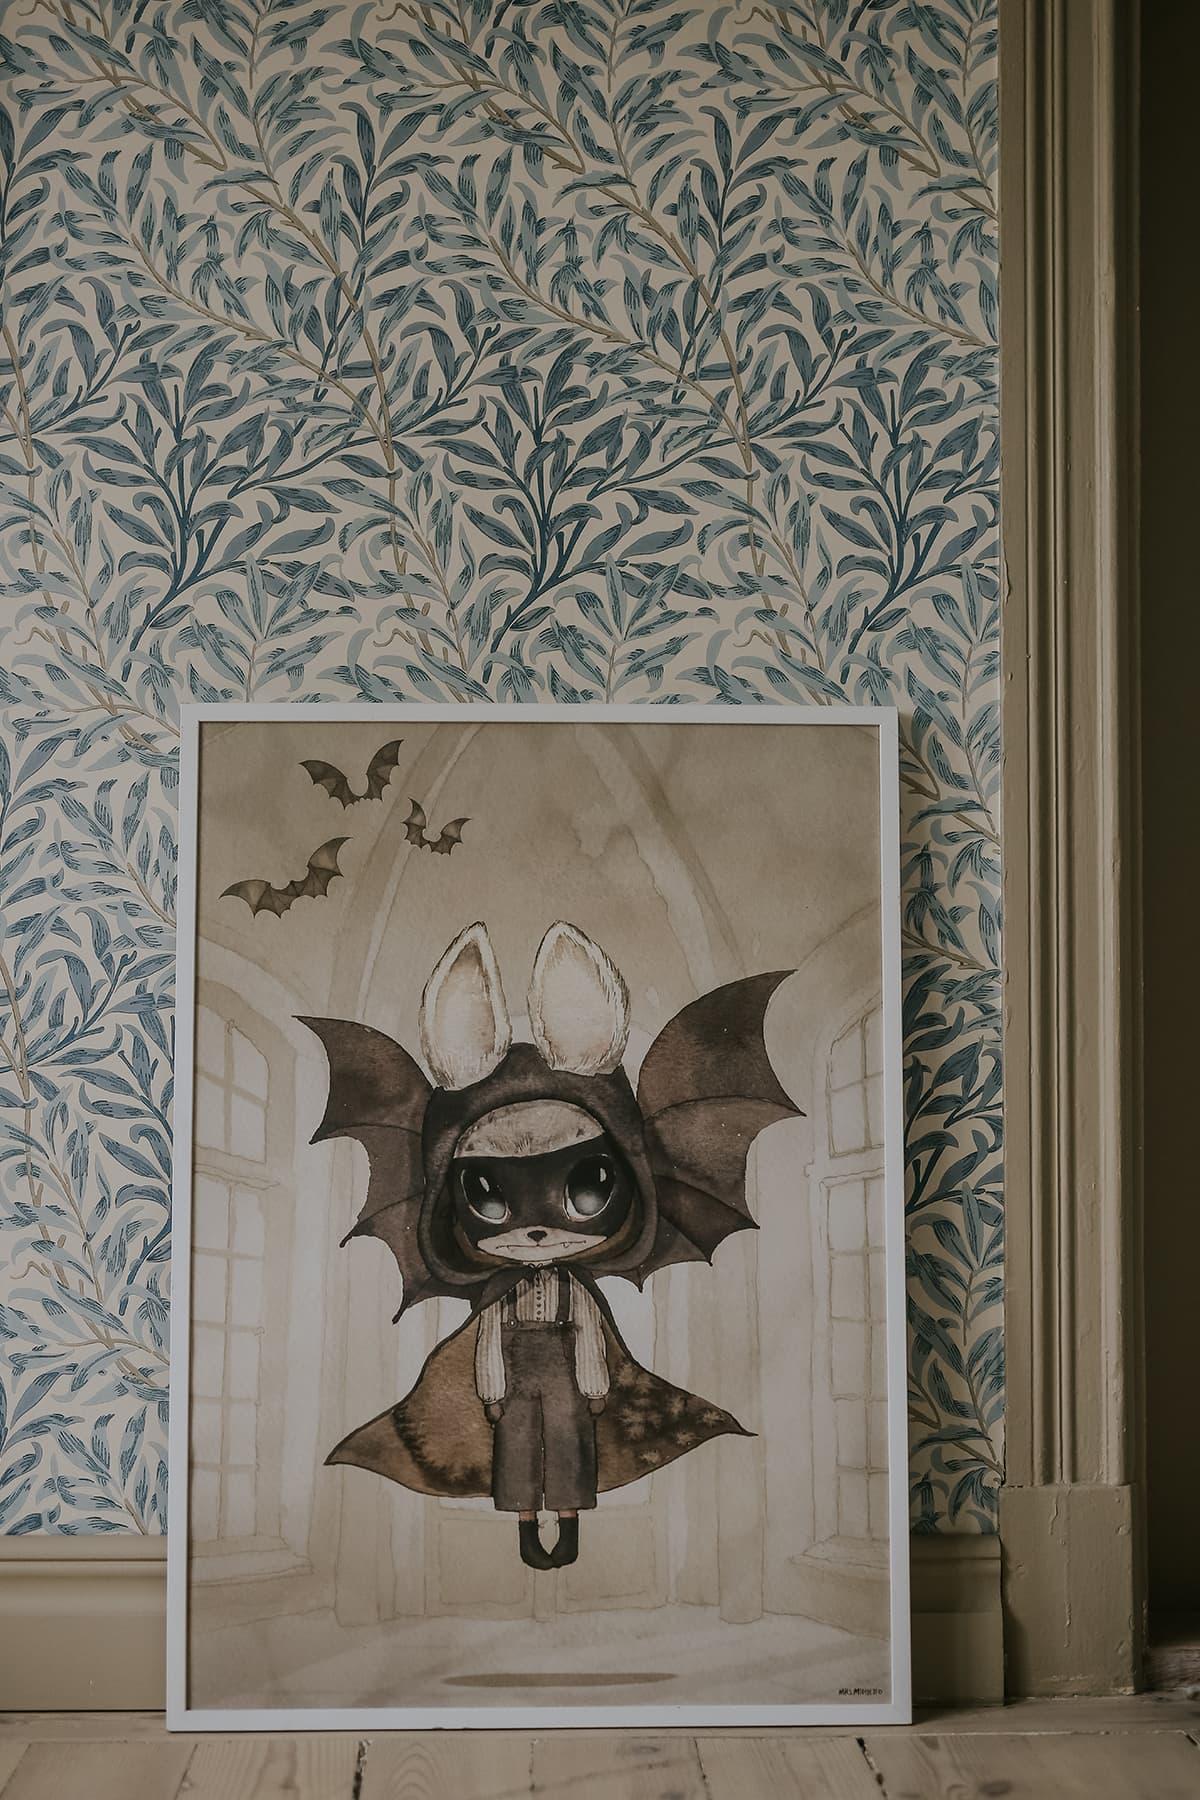 Bat_kidsposter_dekoration_kidsroom_mrsmighetto